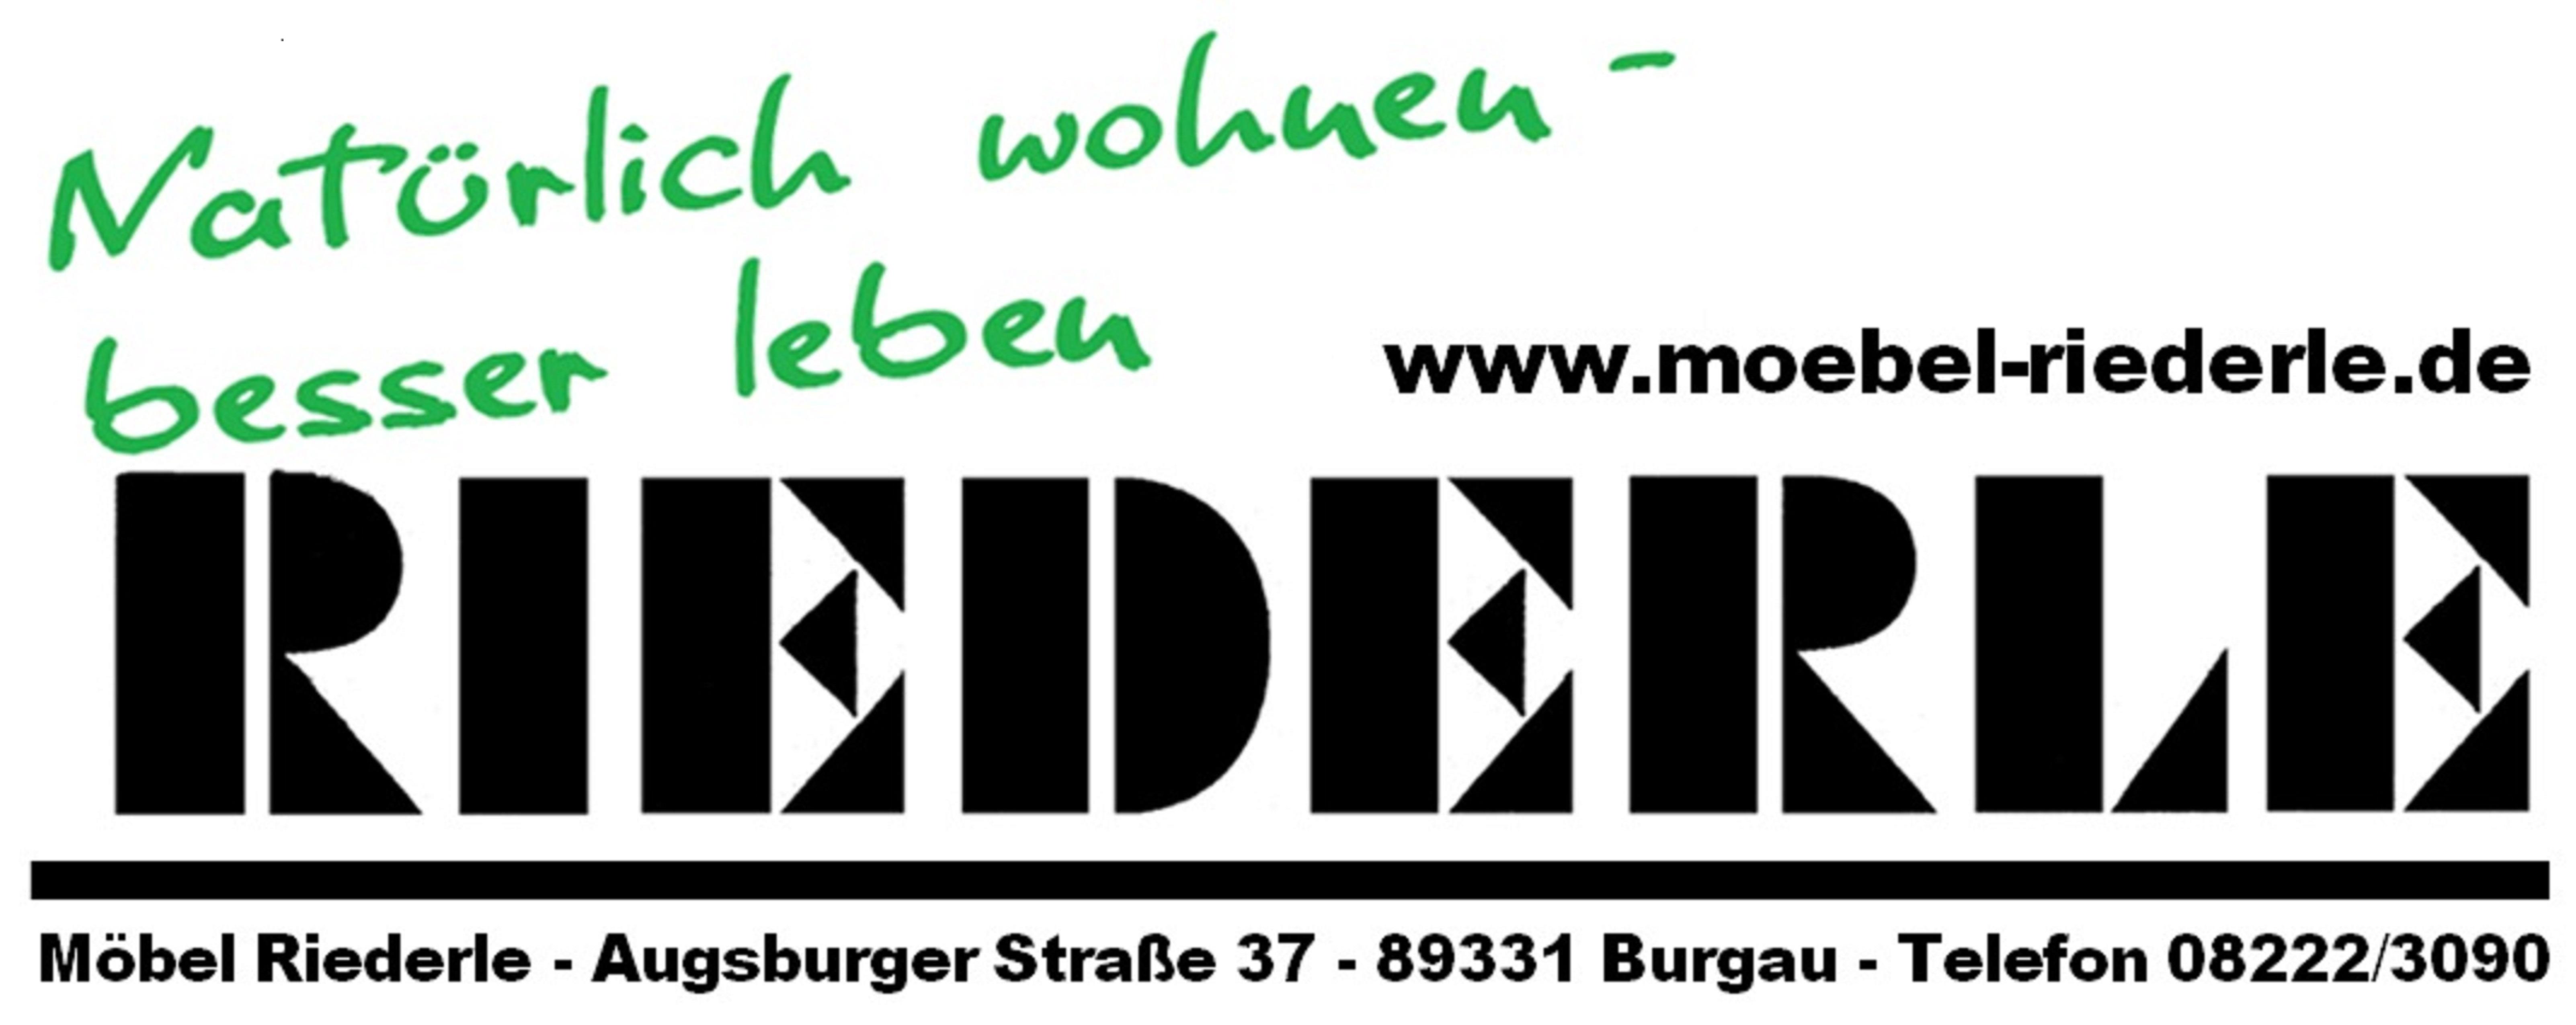 moebel-riederle-einrichtungshaus-ek-burgau logo